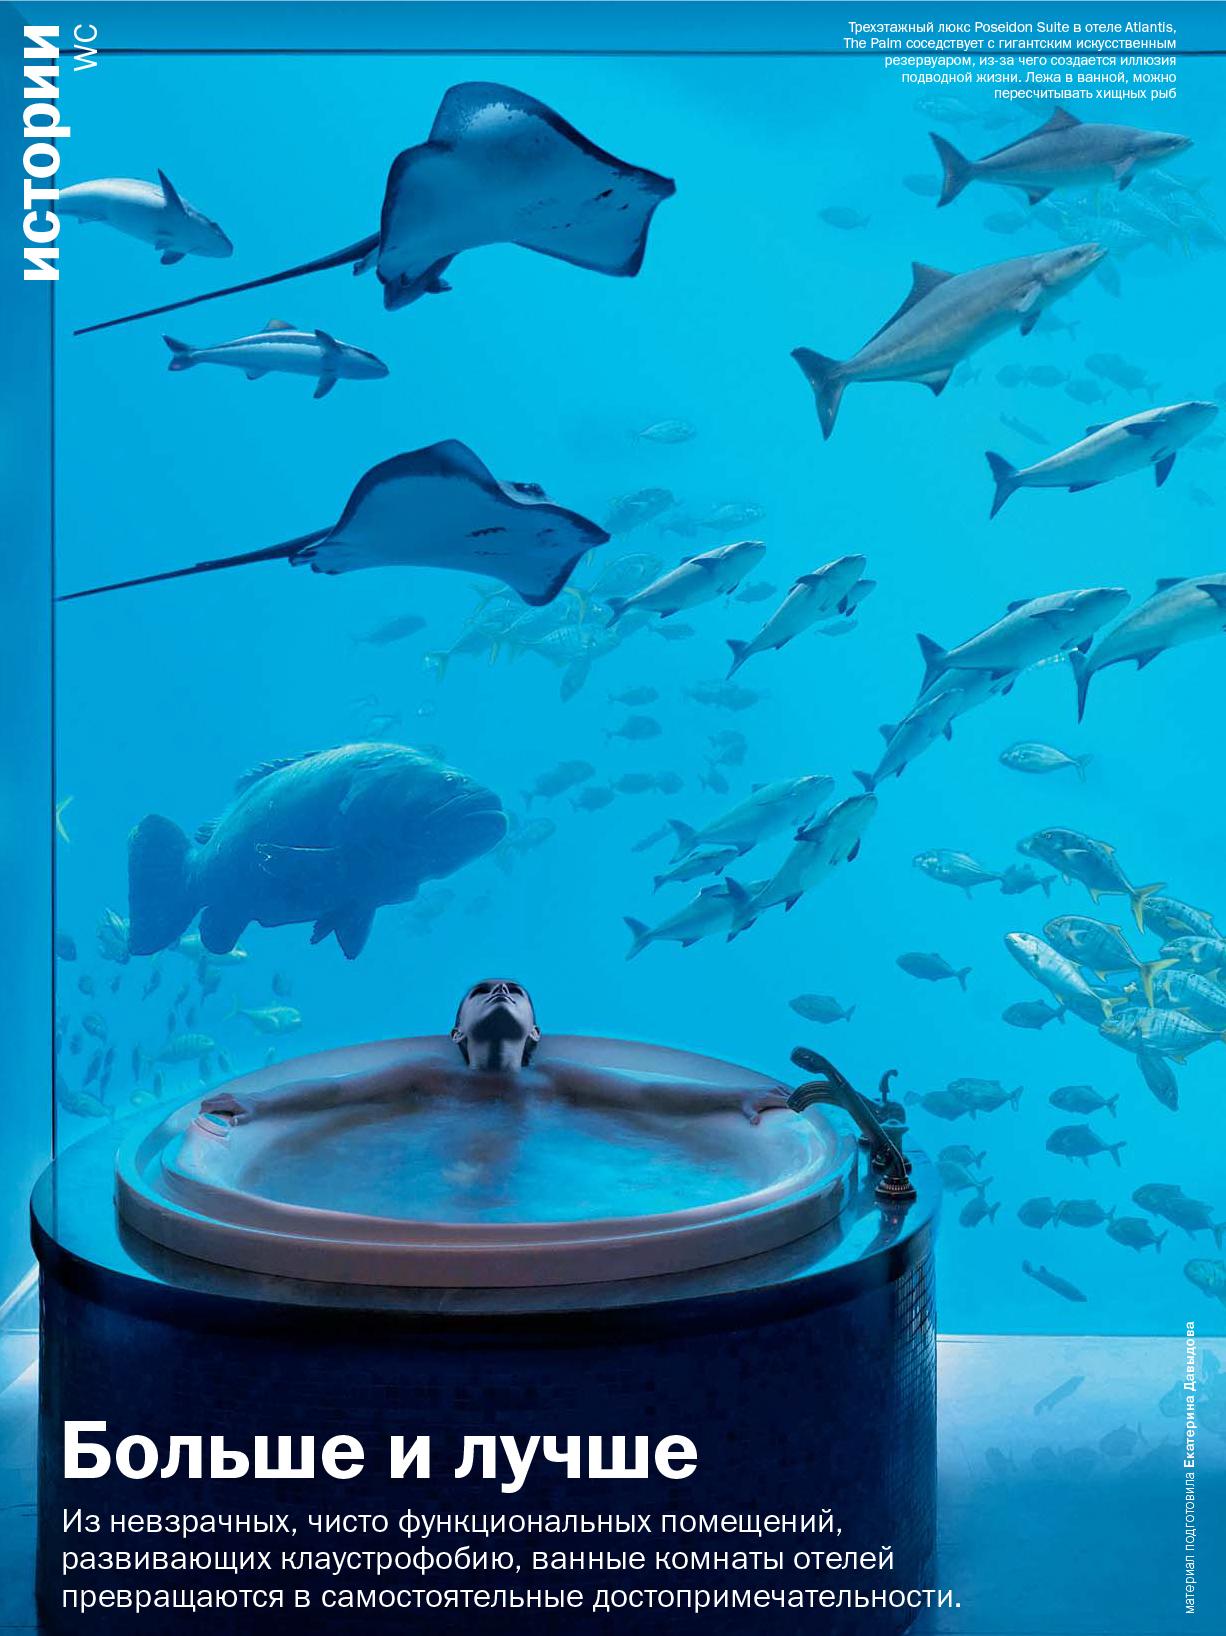 Atlantis_8.jpg